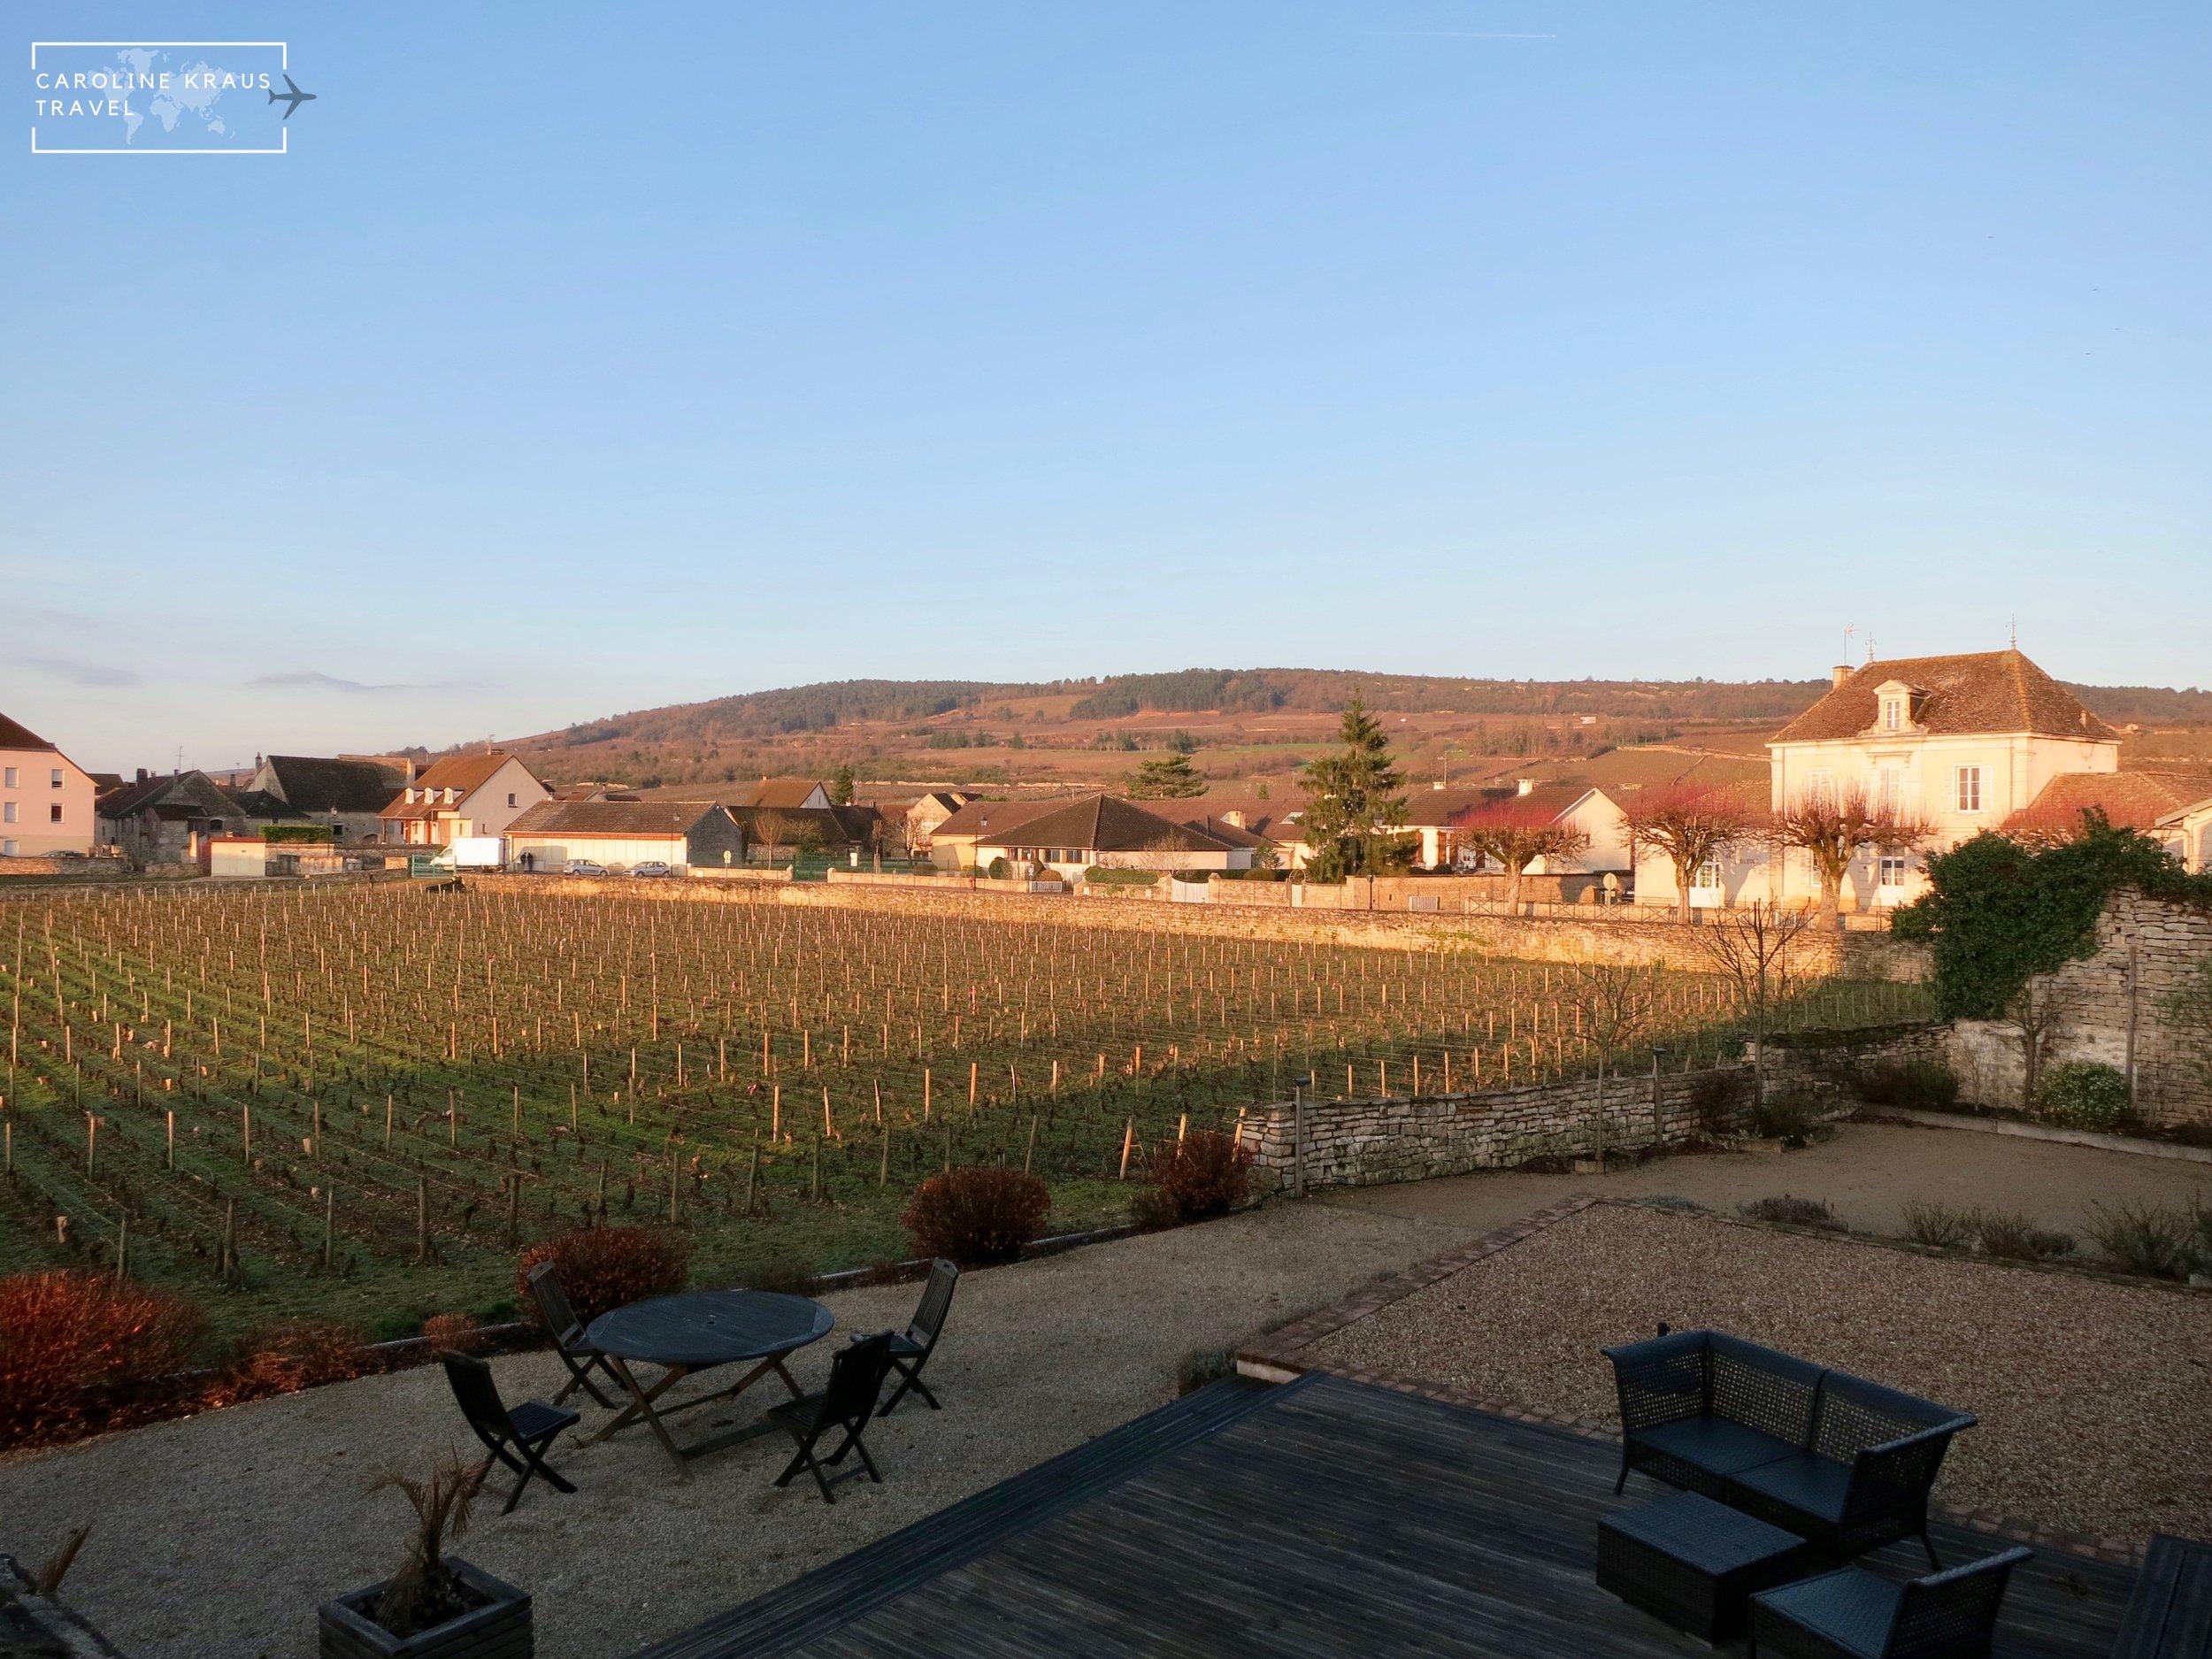 Morning light on the backyard vineyard